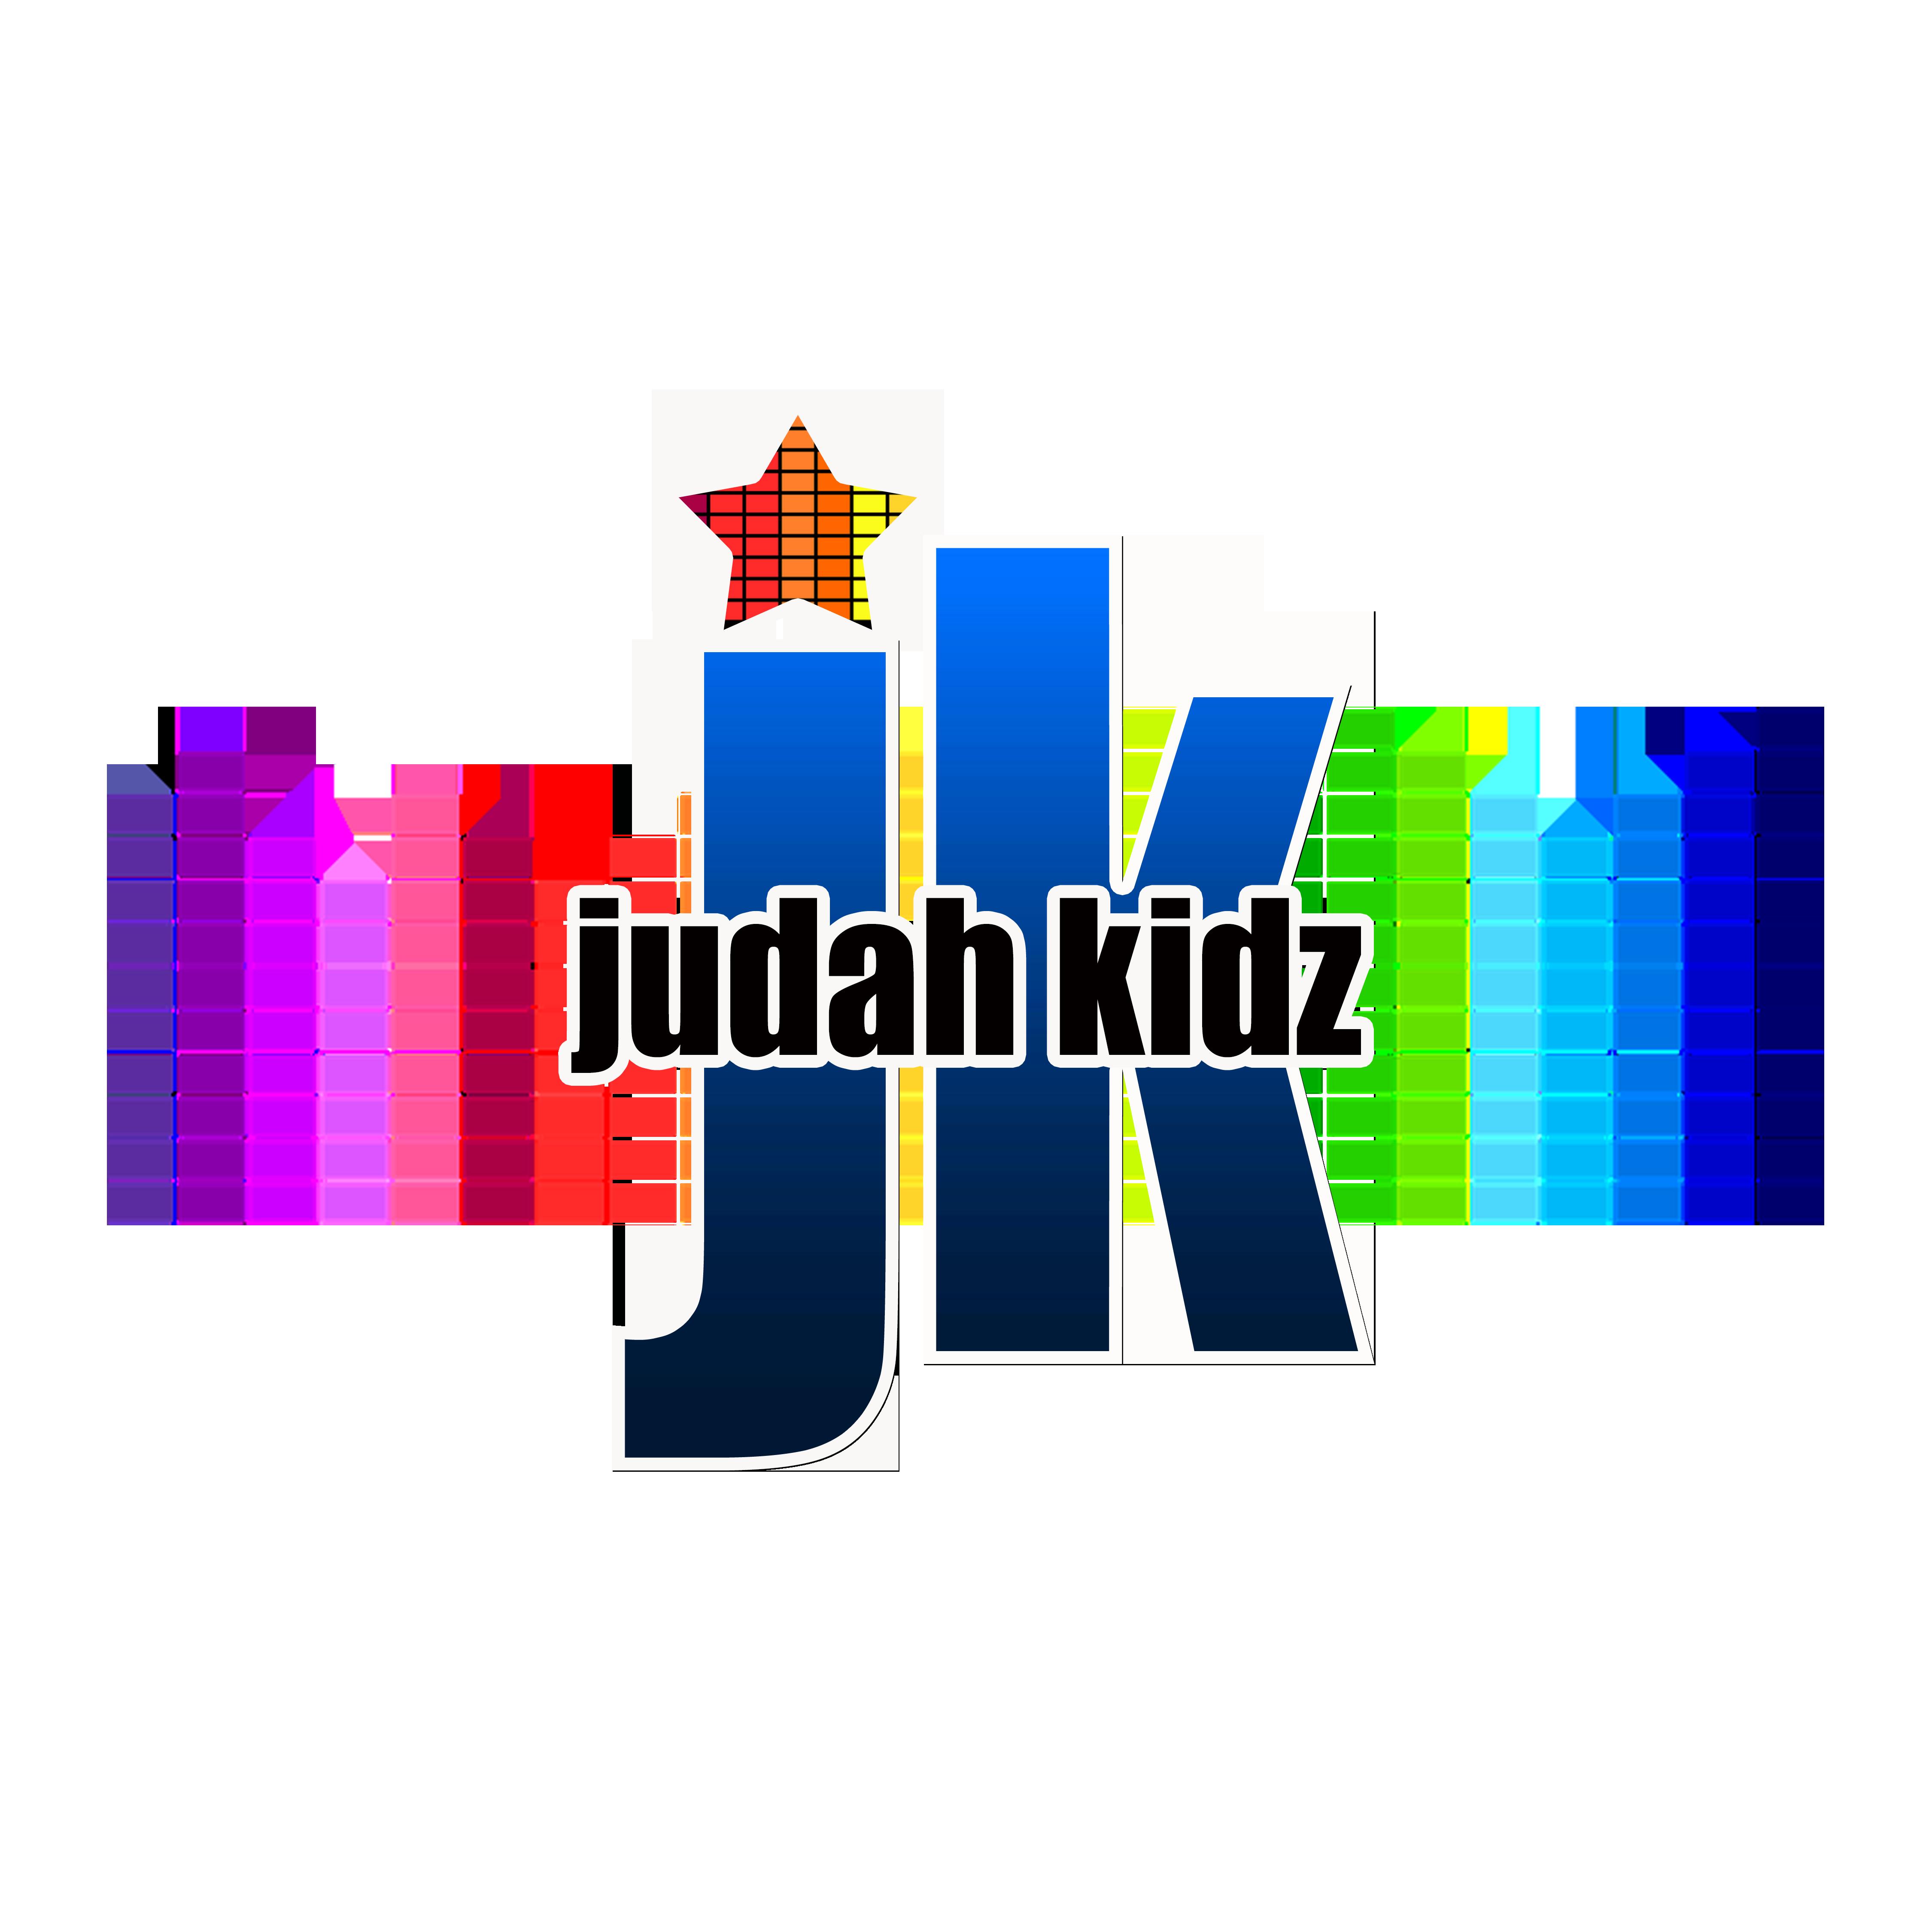 JudahKidsLogo